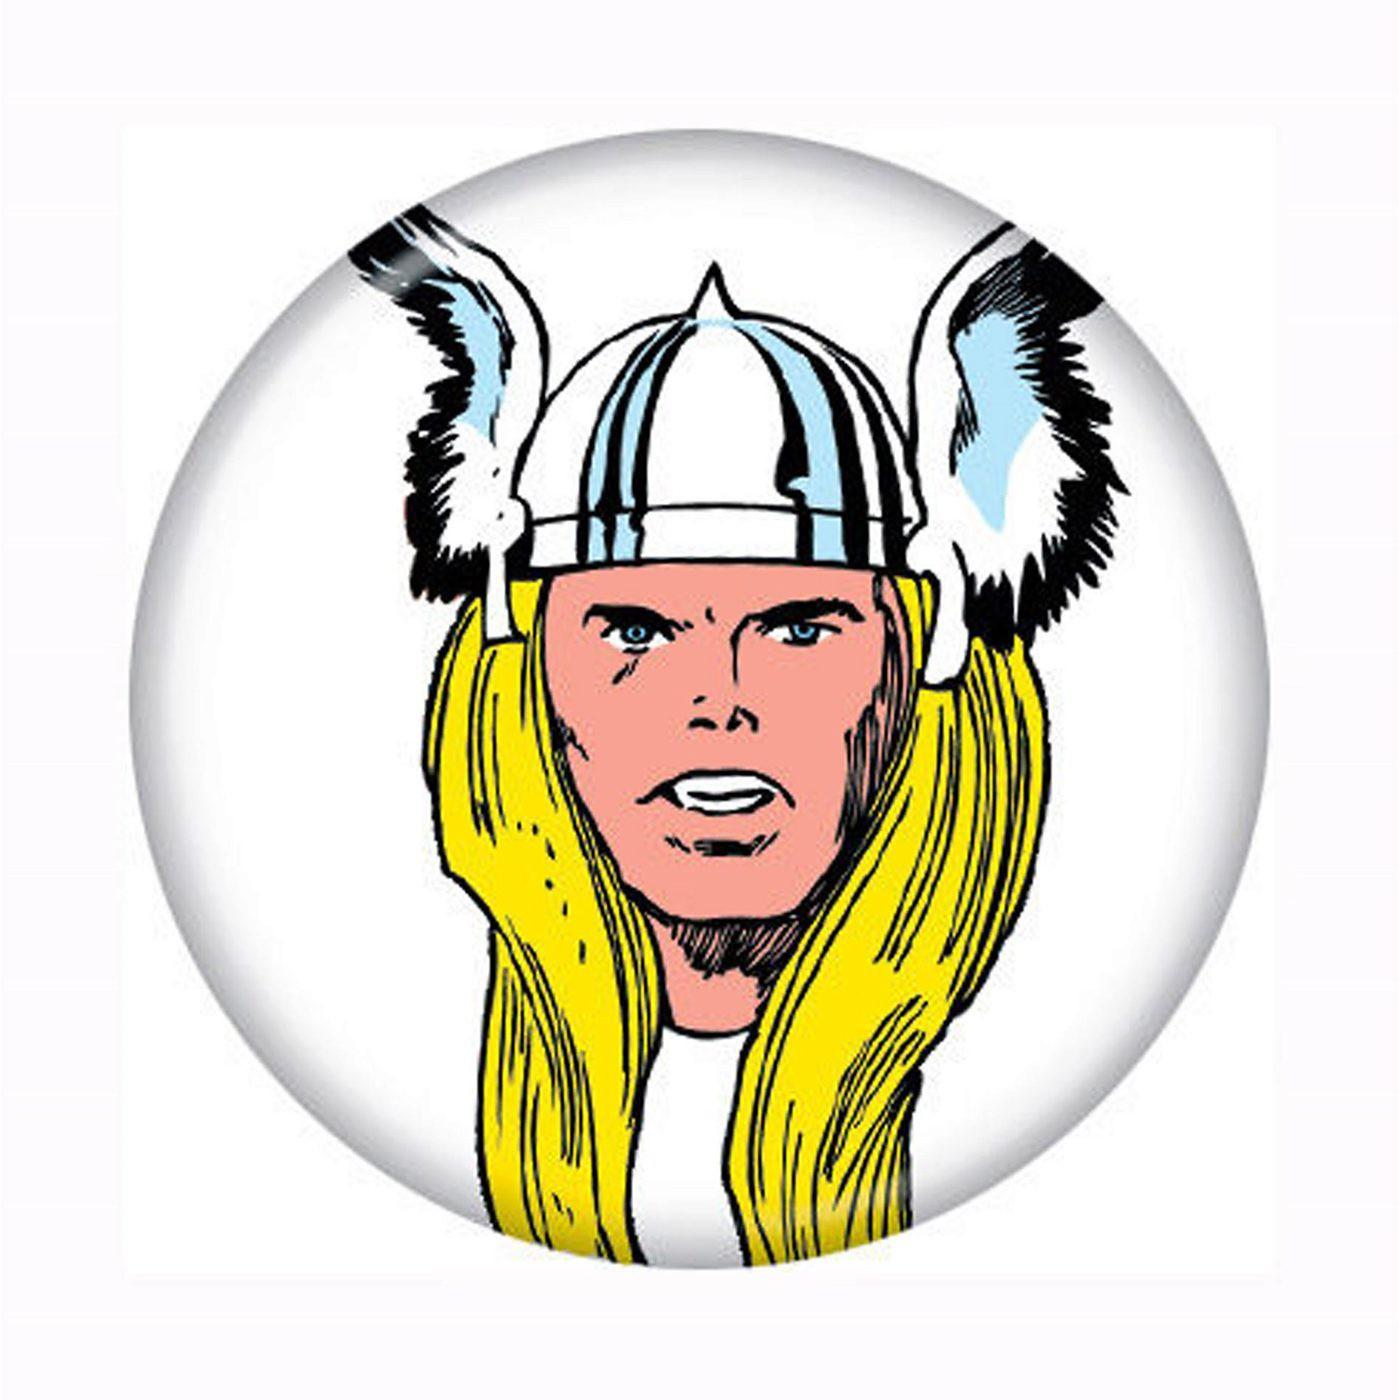 Thor Helmed Head Button